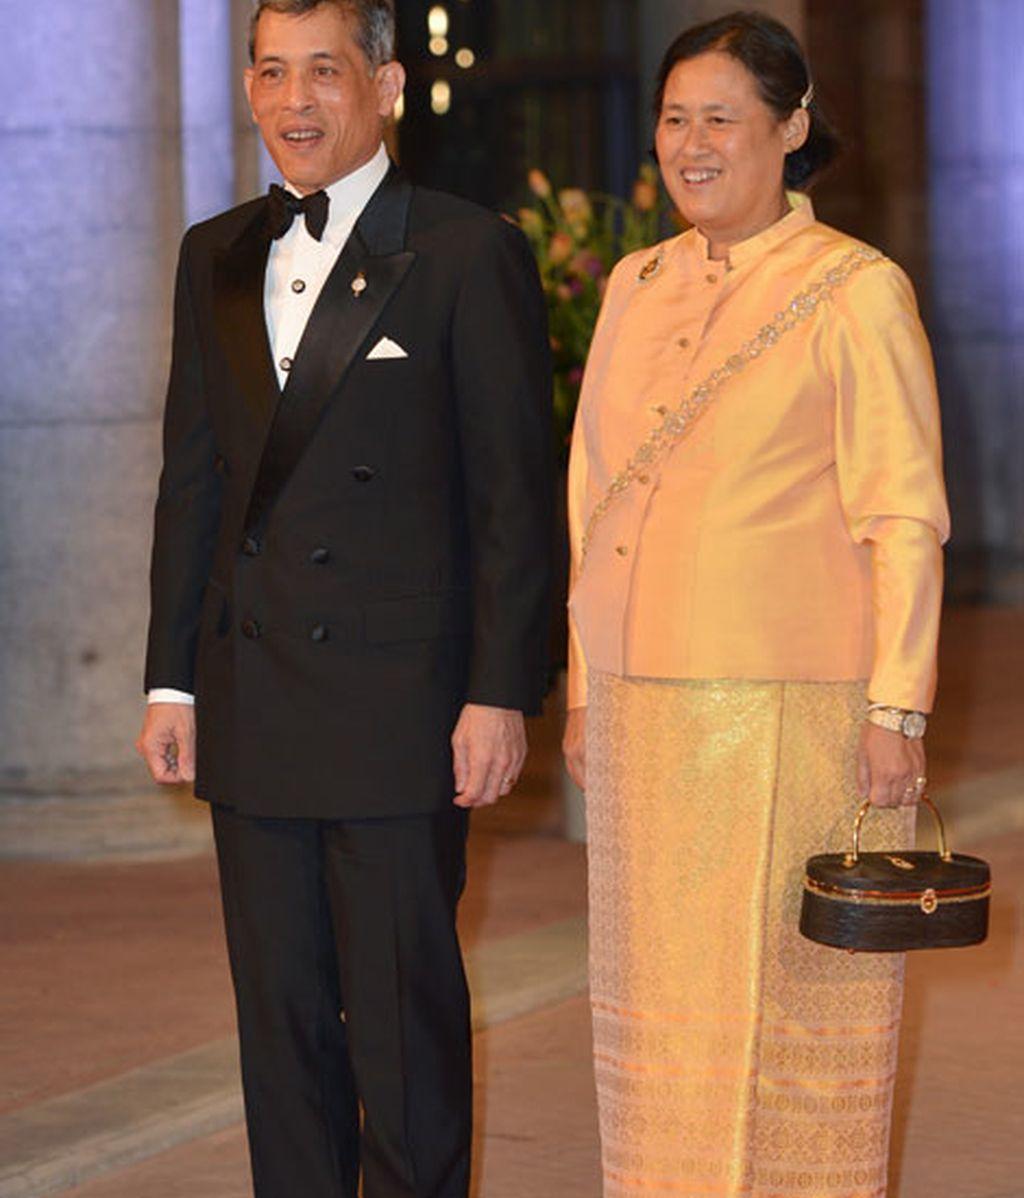 La princesa de Tailandia, Maha Chakri Sirindhorn, apostó por el amarillo